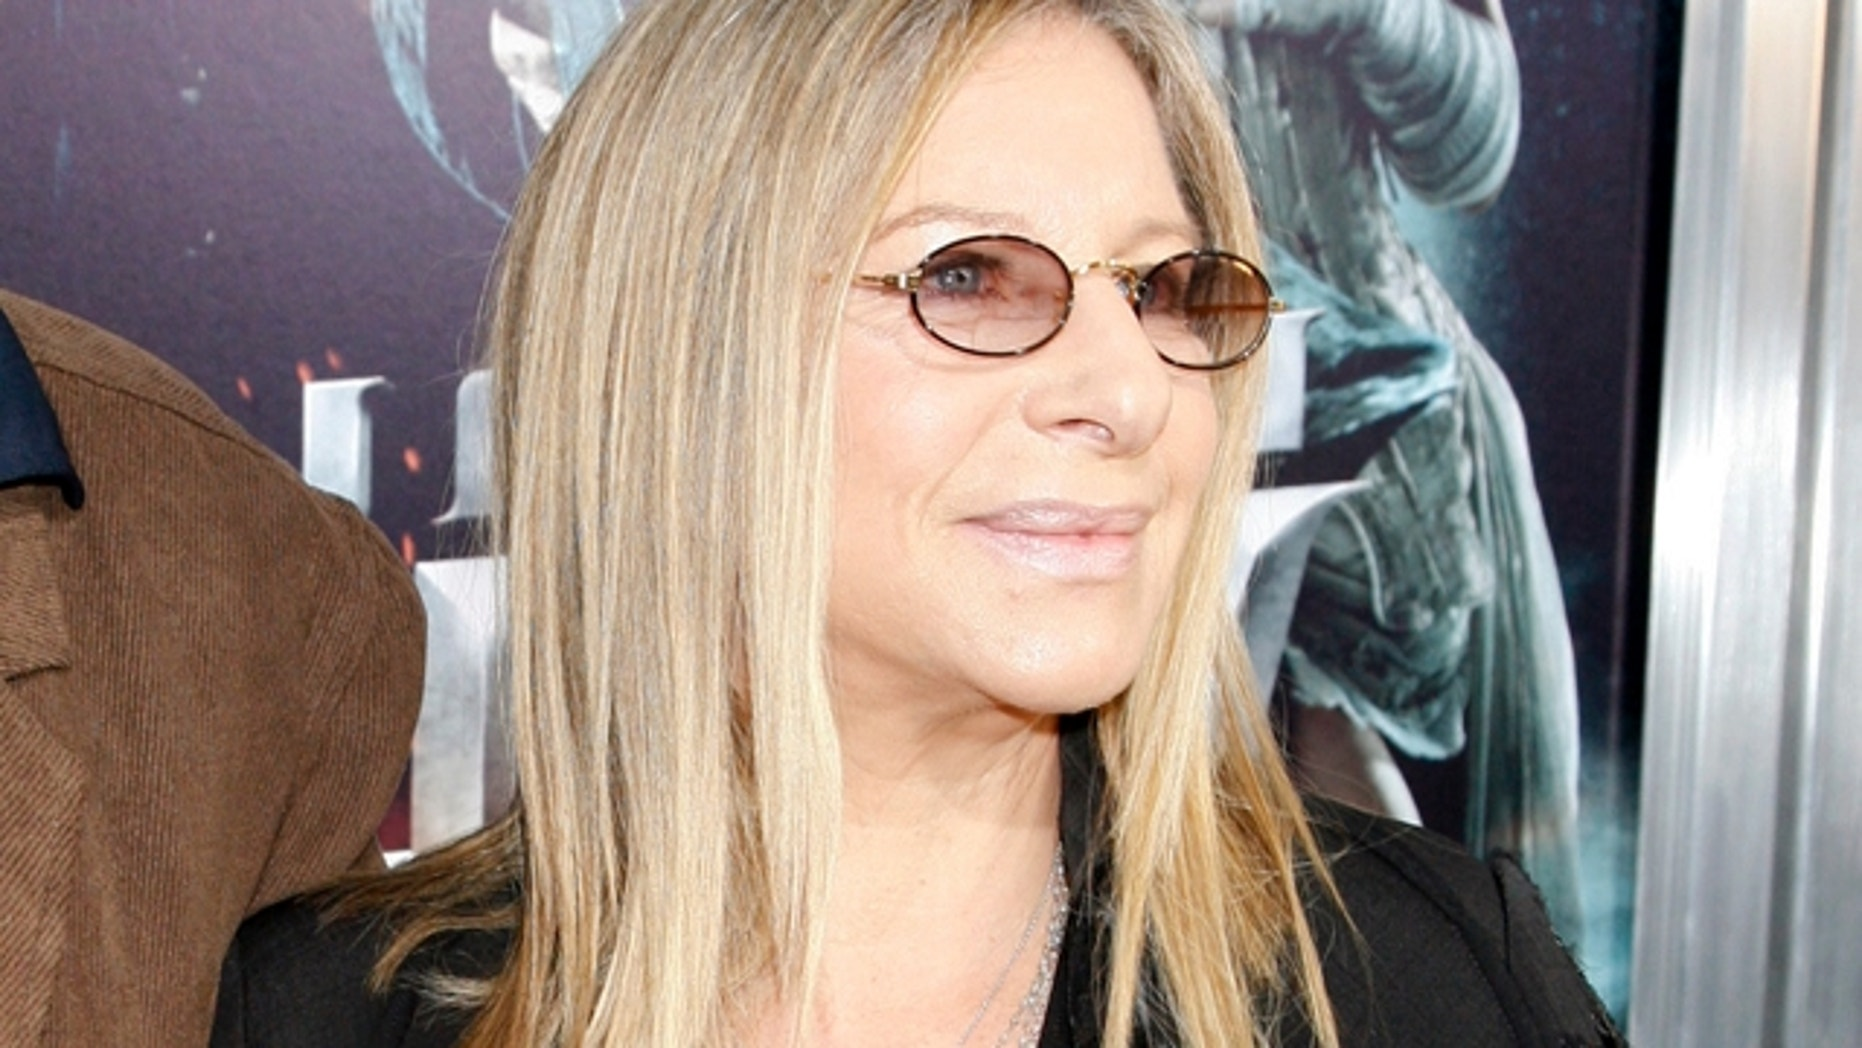 Barbra Streisand. (Reuters)